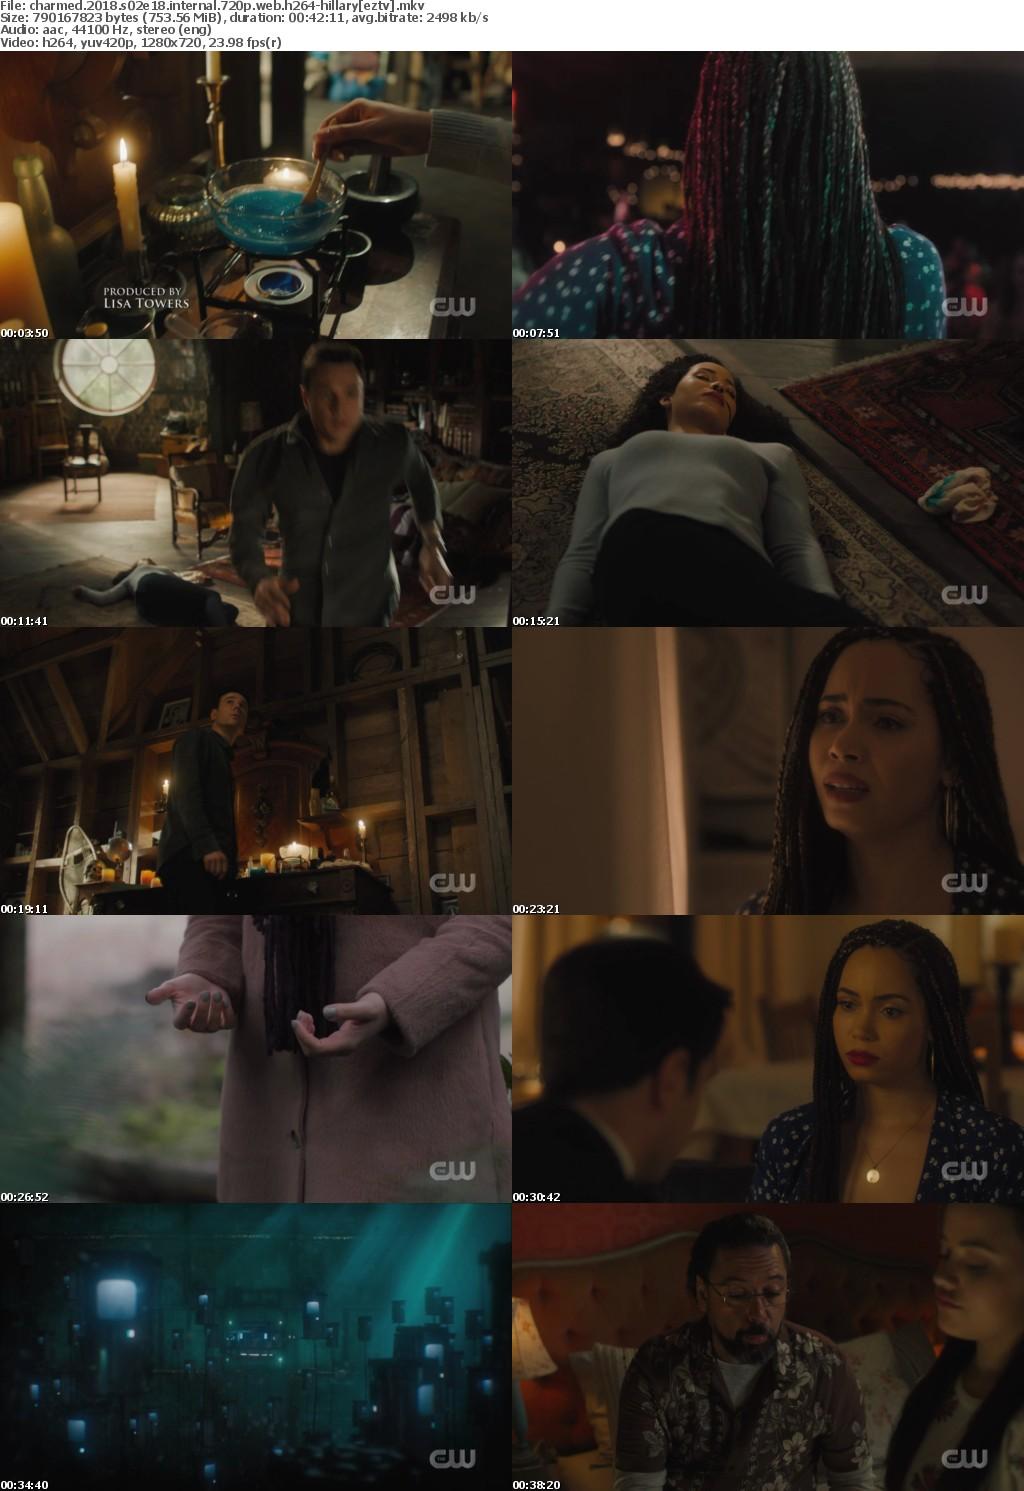 Charmed 2018 S02E18 iNTERNAL 720p WEB h264-HILLARY